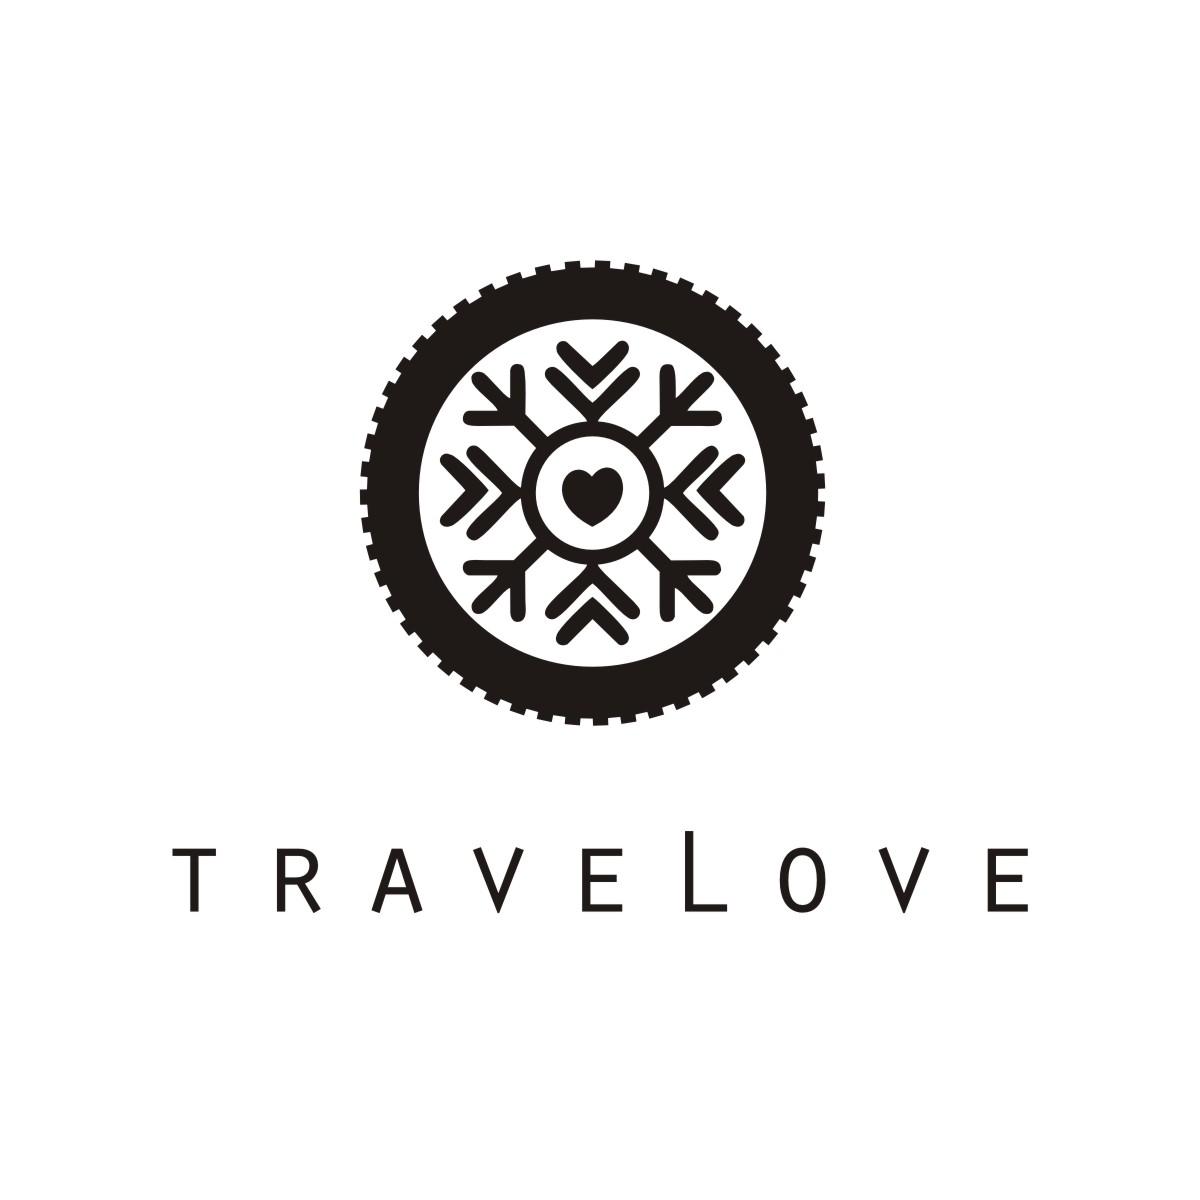 traveLove